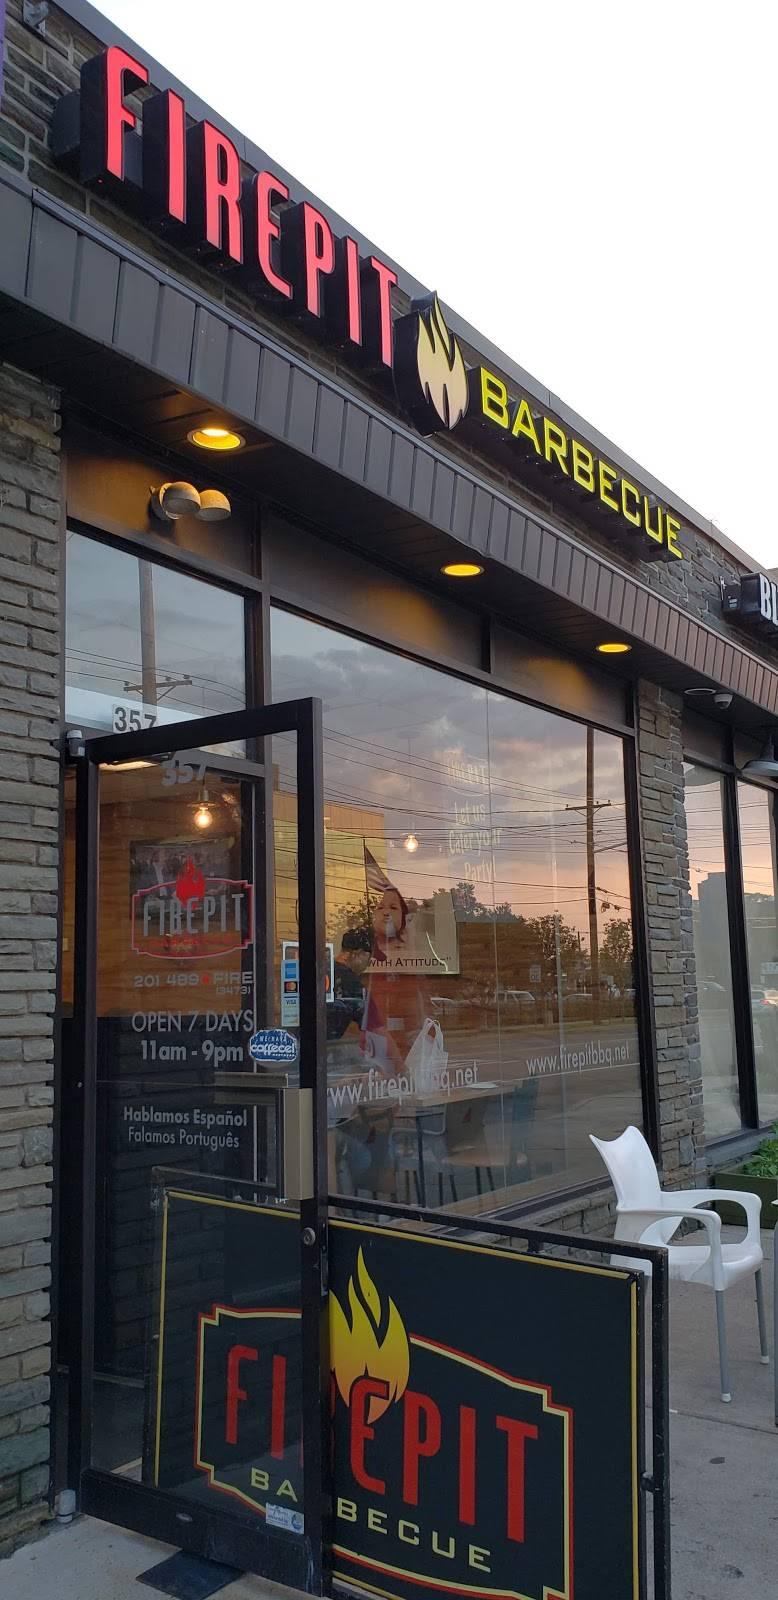 Fire Pit BBQ | restaurant | 357 Essex St, Hackensack, NJ 07601, USA | 2014893473 OR +1 201-489-3473